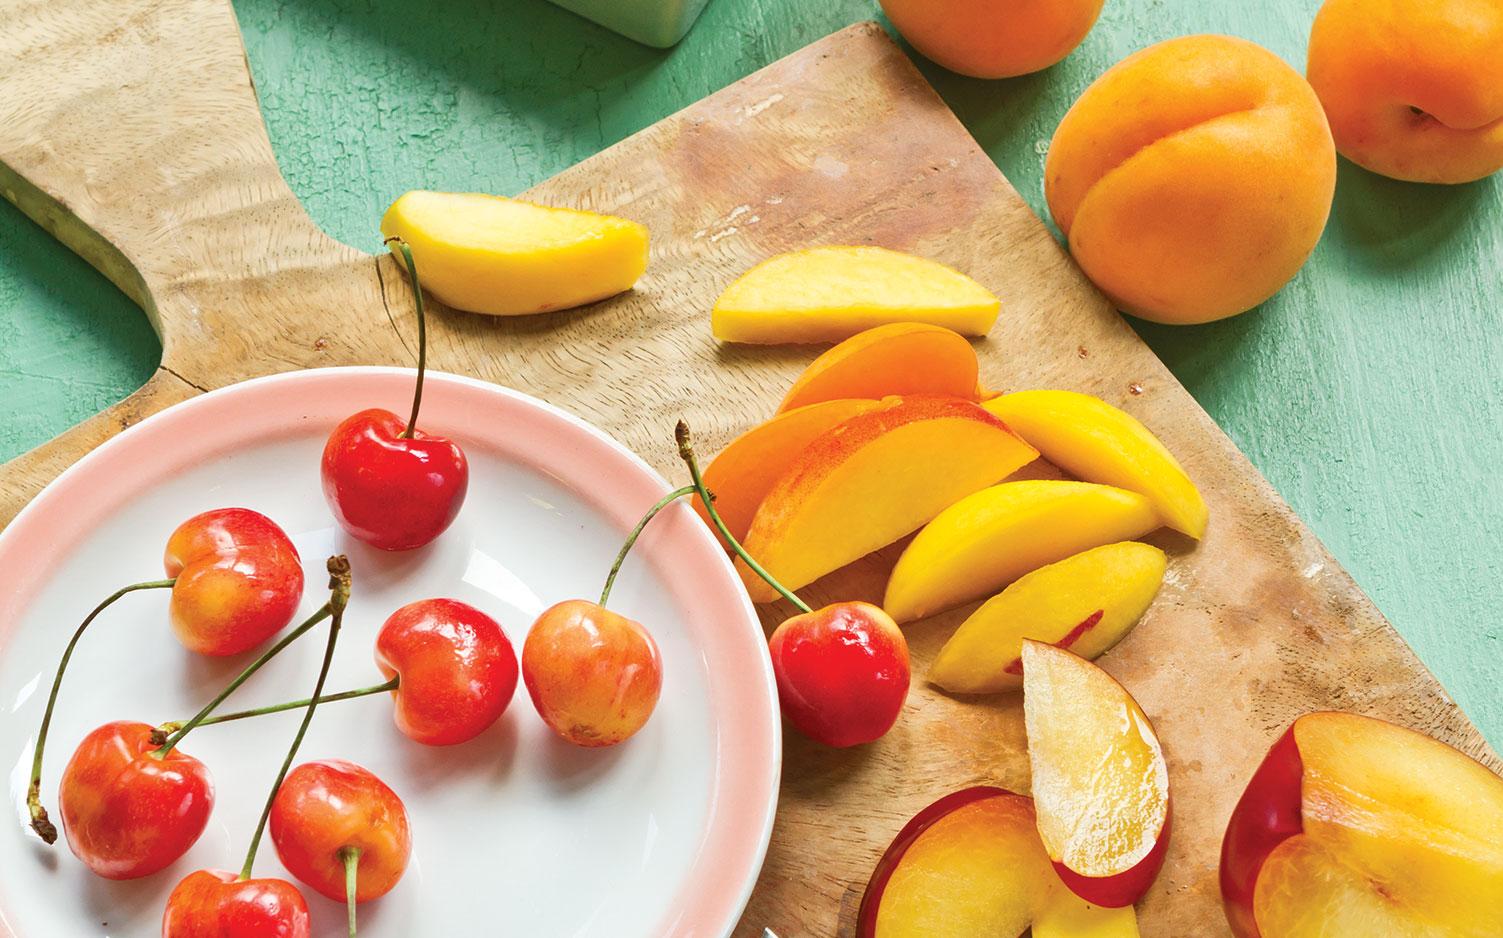 Stone Fruits, peaches and cherries